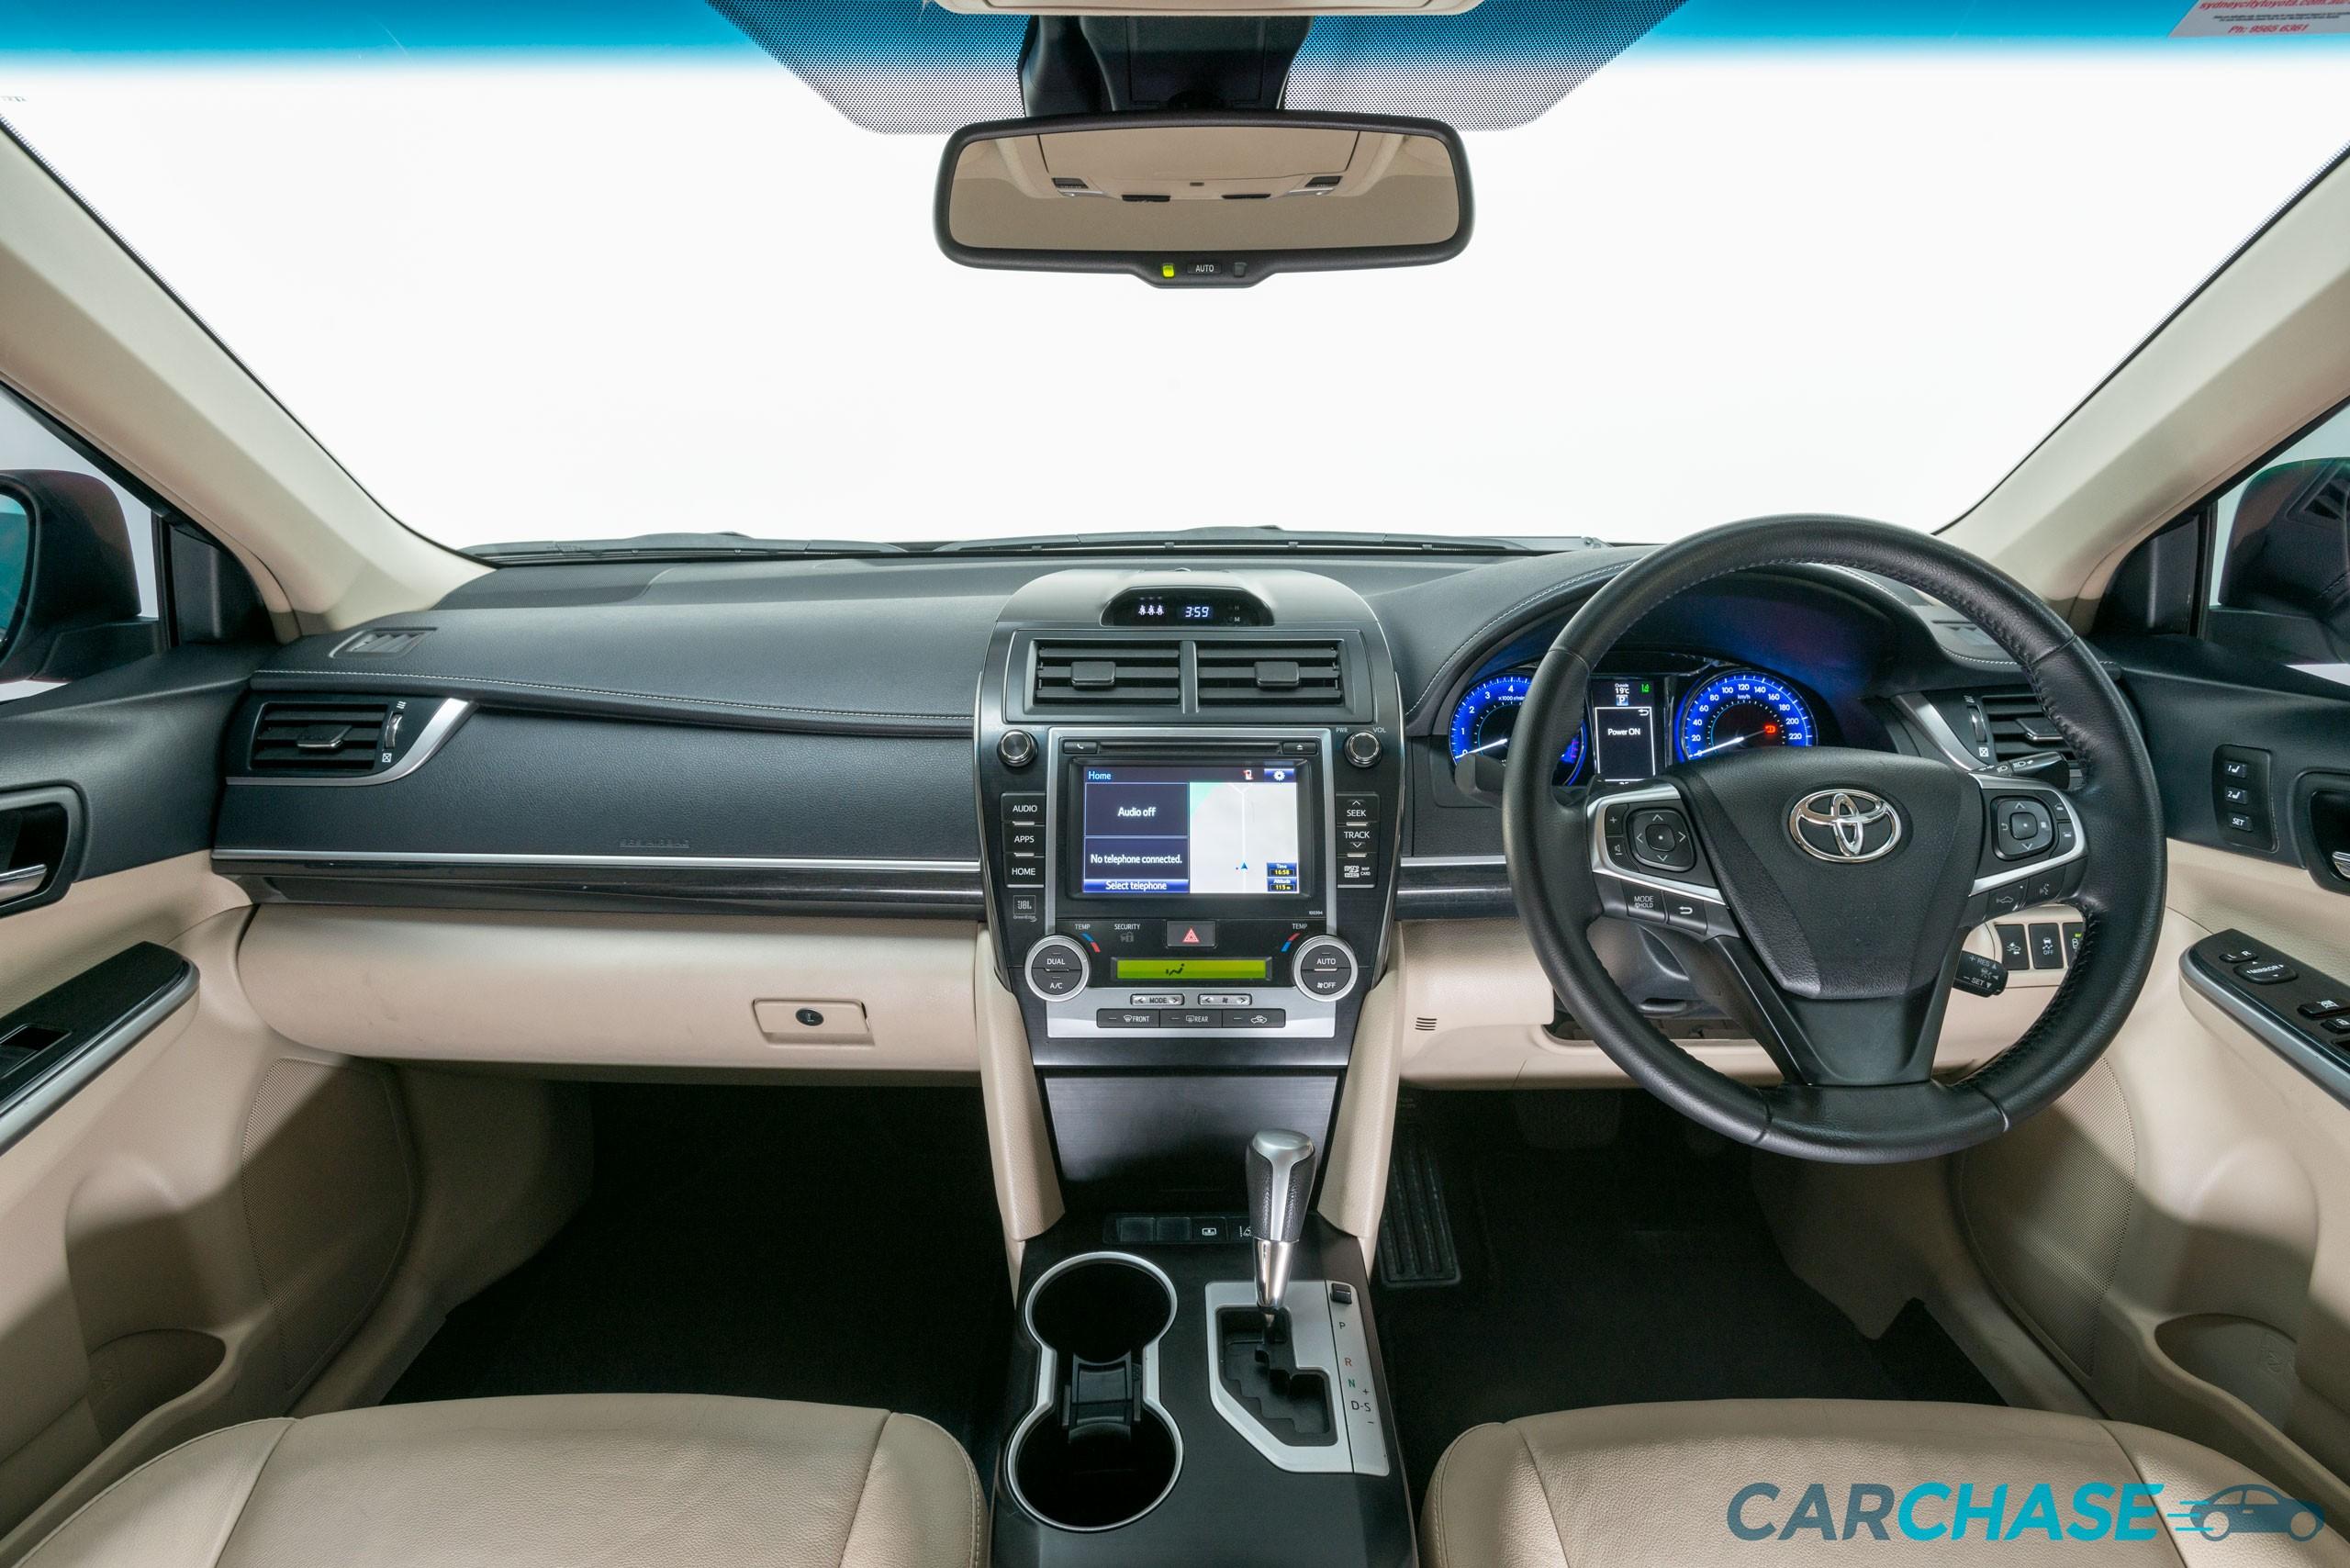 Image of dashboard profile of 2015 Toyota Camry Atara SL